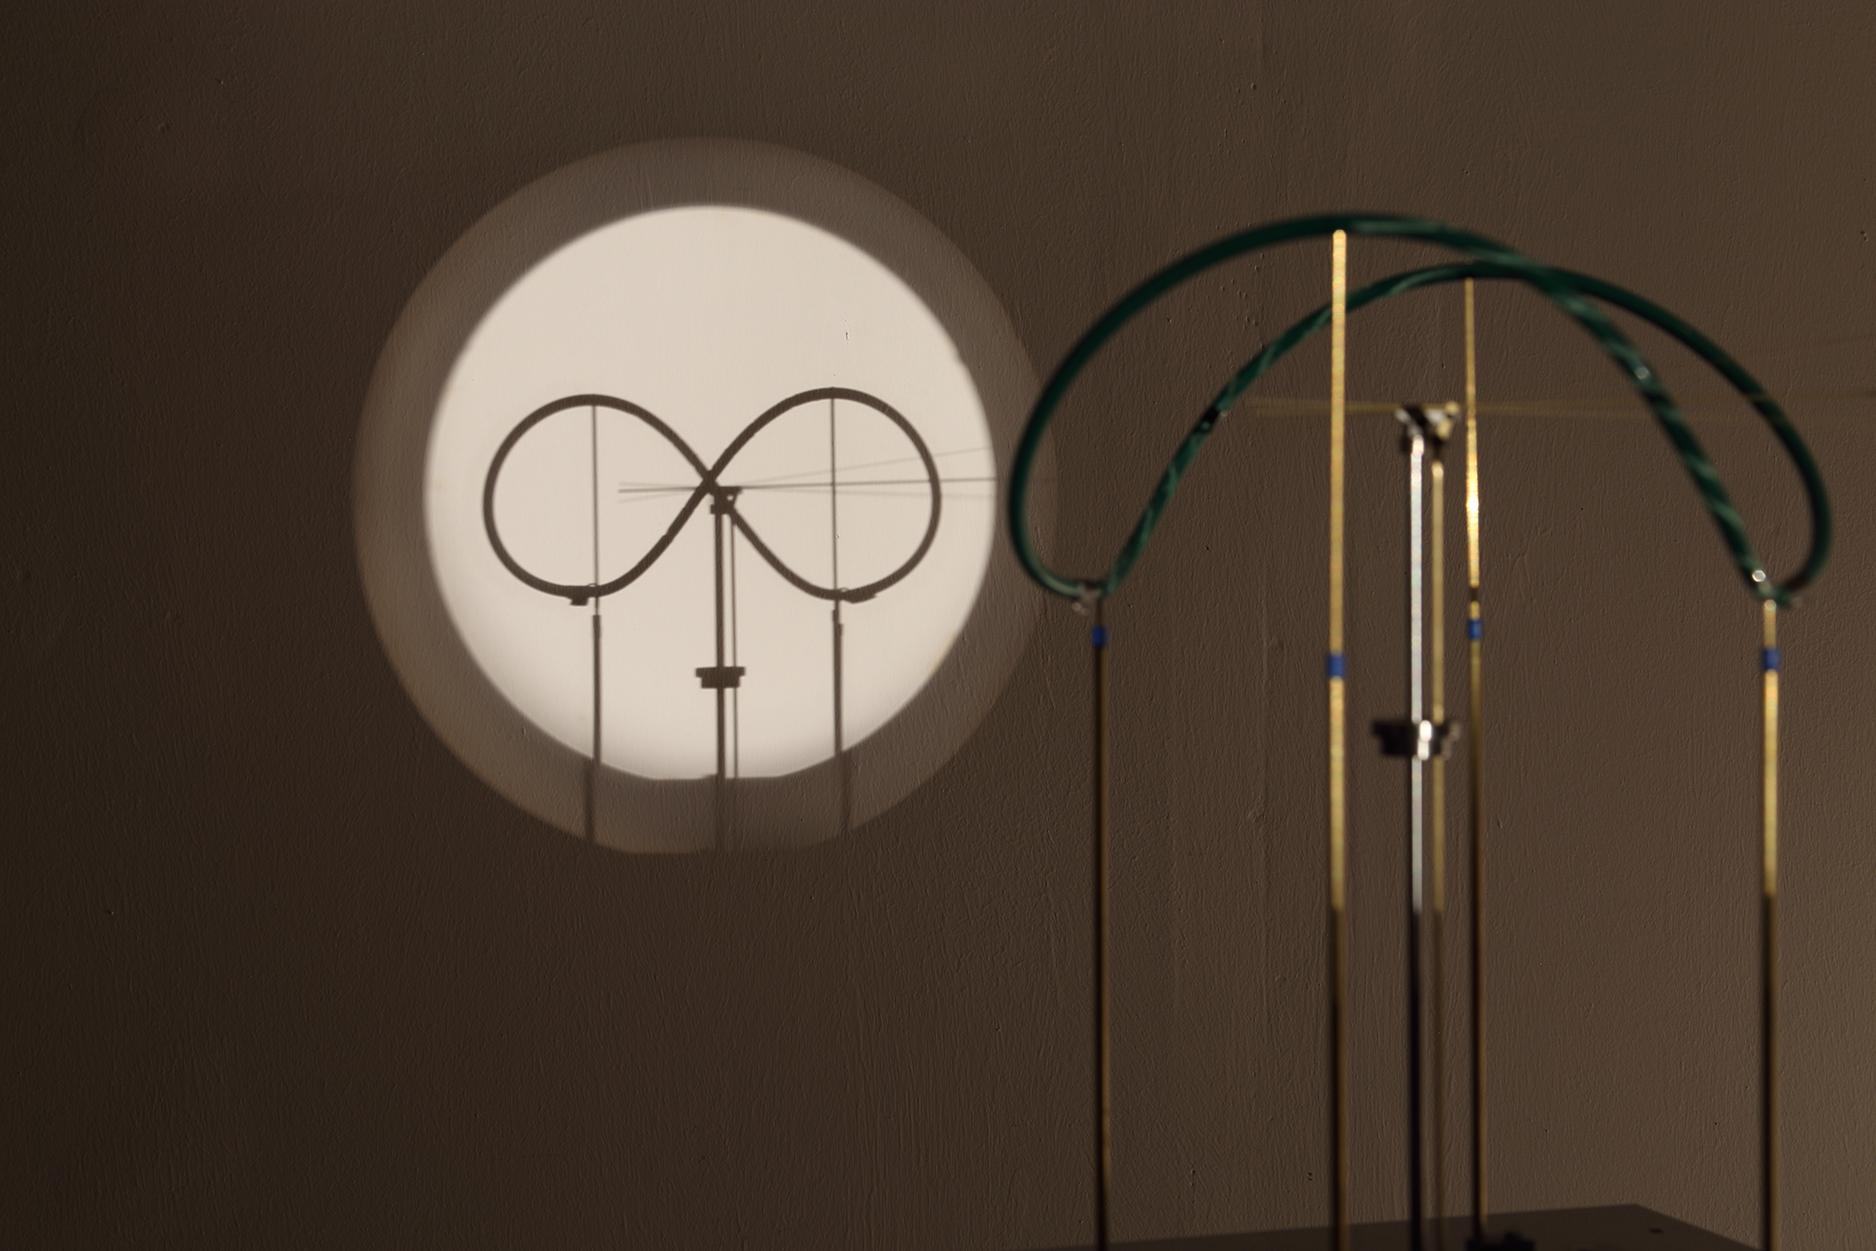 Óramű / Clock Work, 2017. kinetic construction, installation, dimension variable, Ed. of 2